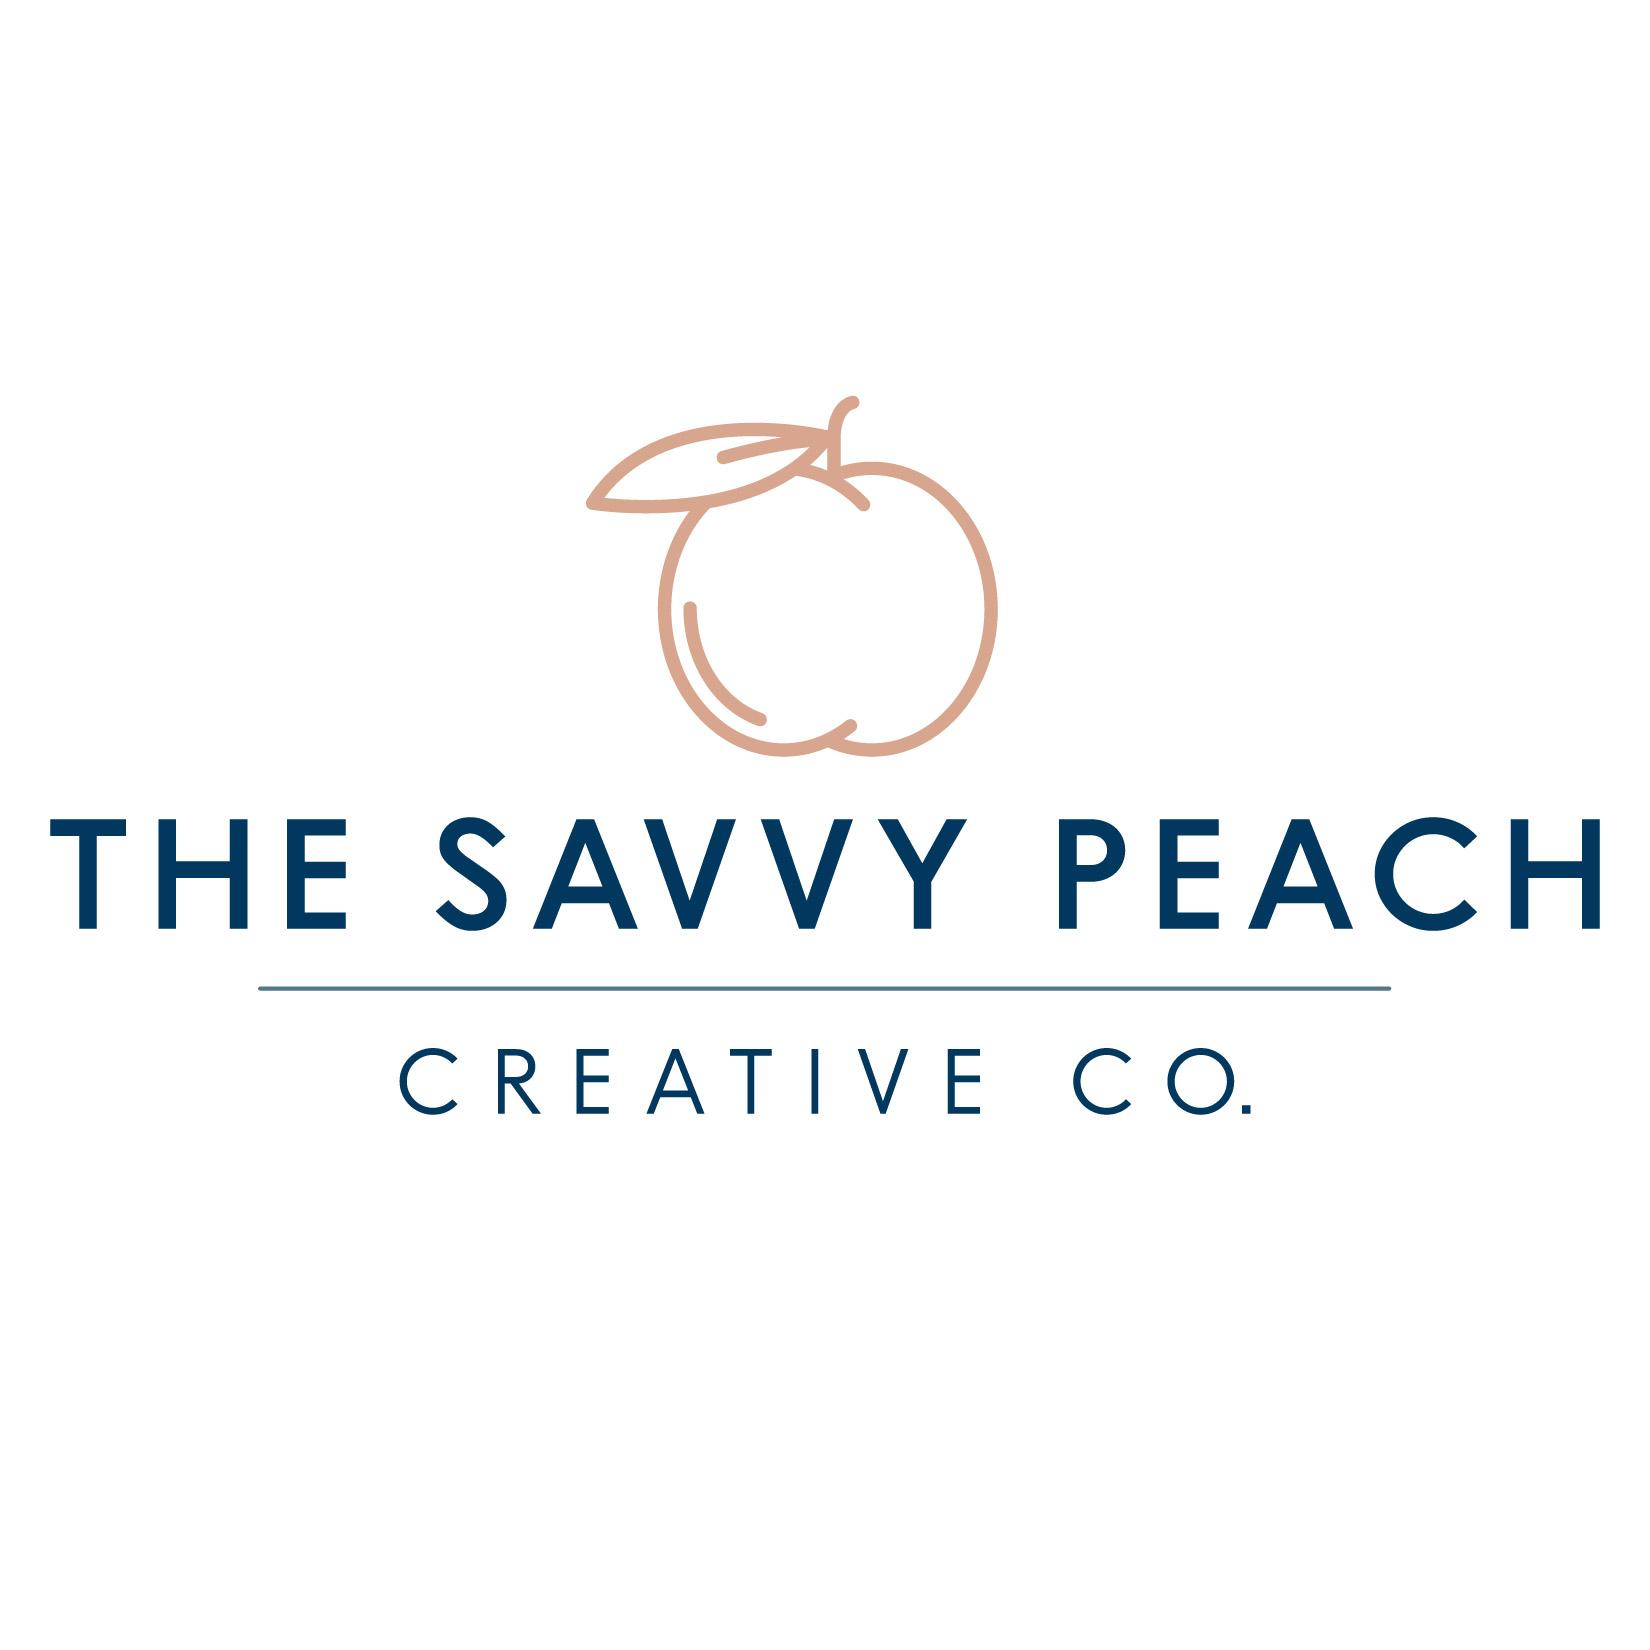 The Savvy Peach Creative Co. Logo